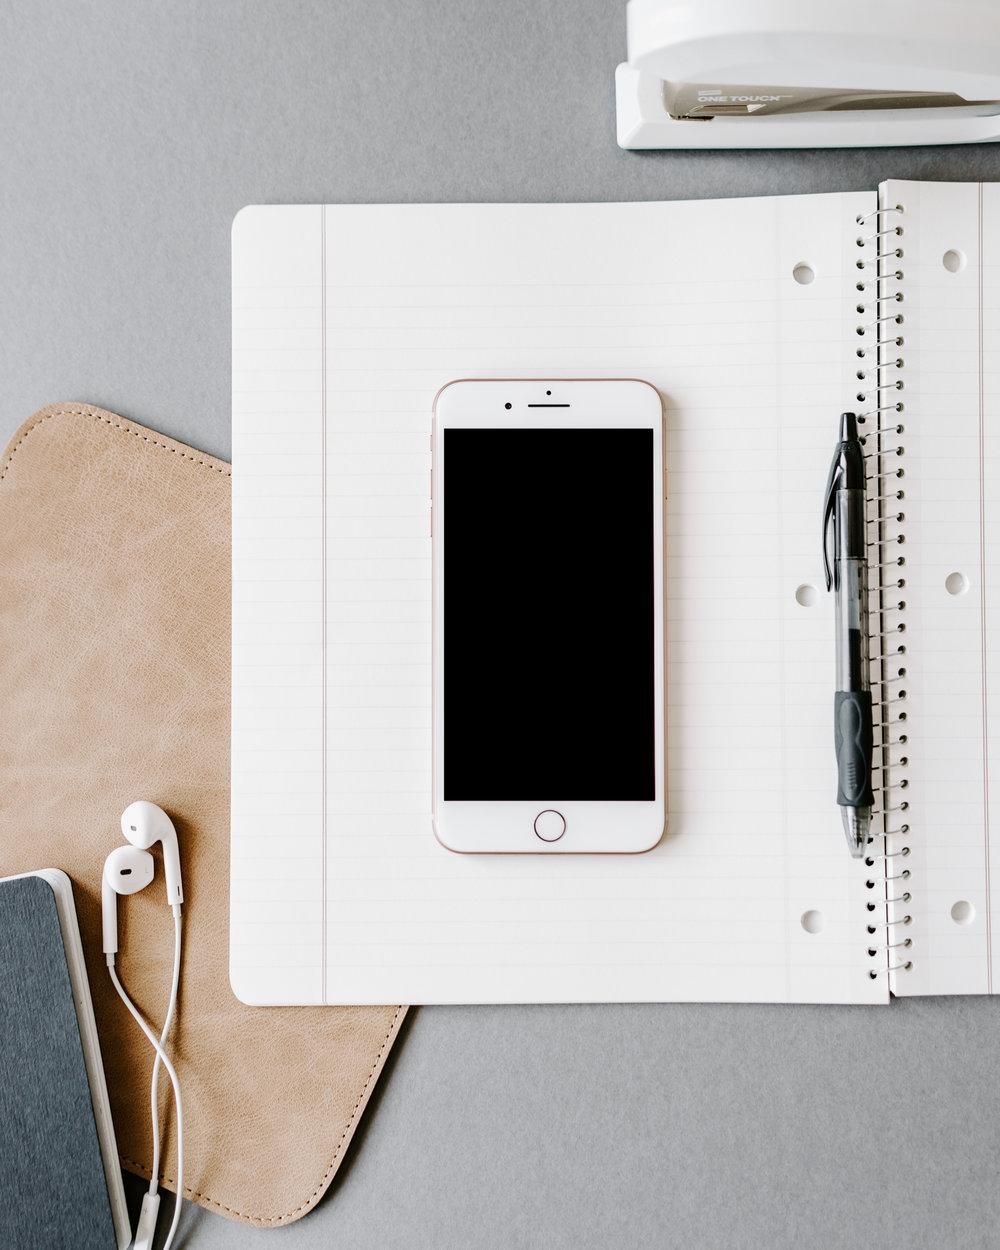 My Social Media Strategy for 2019 | Alexa B. Creative & Design